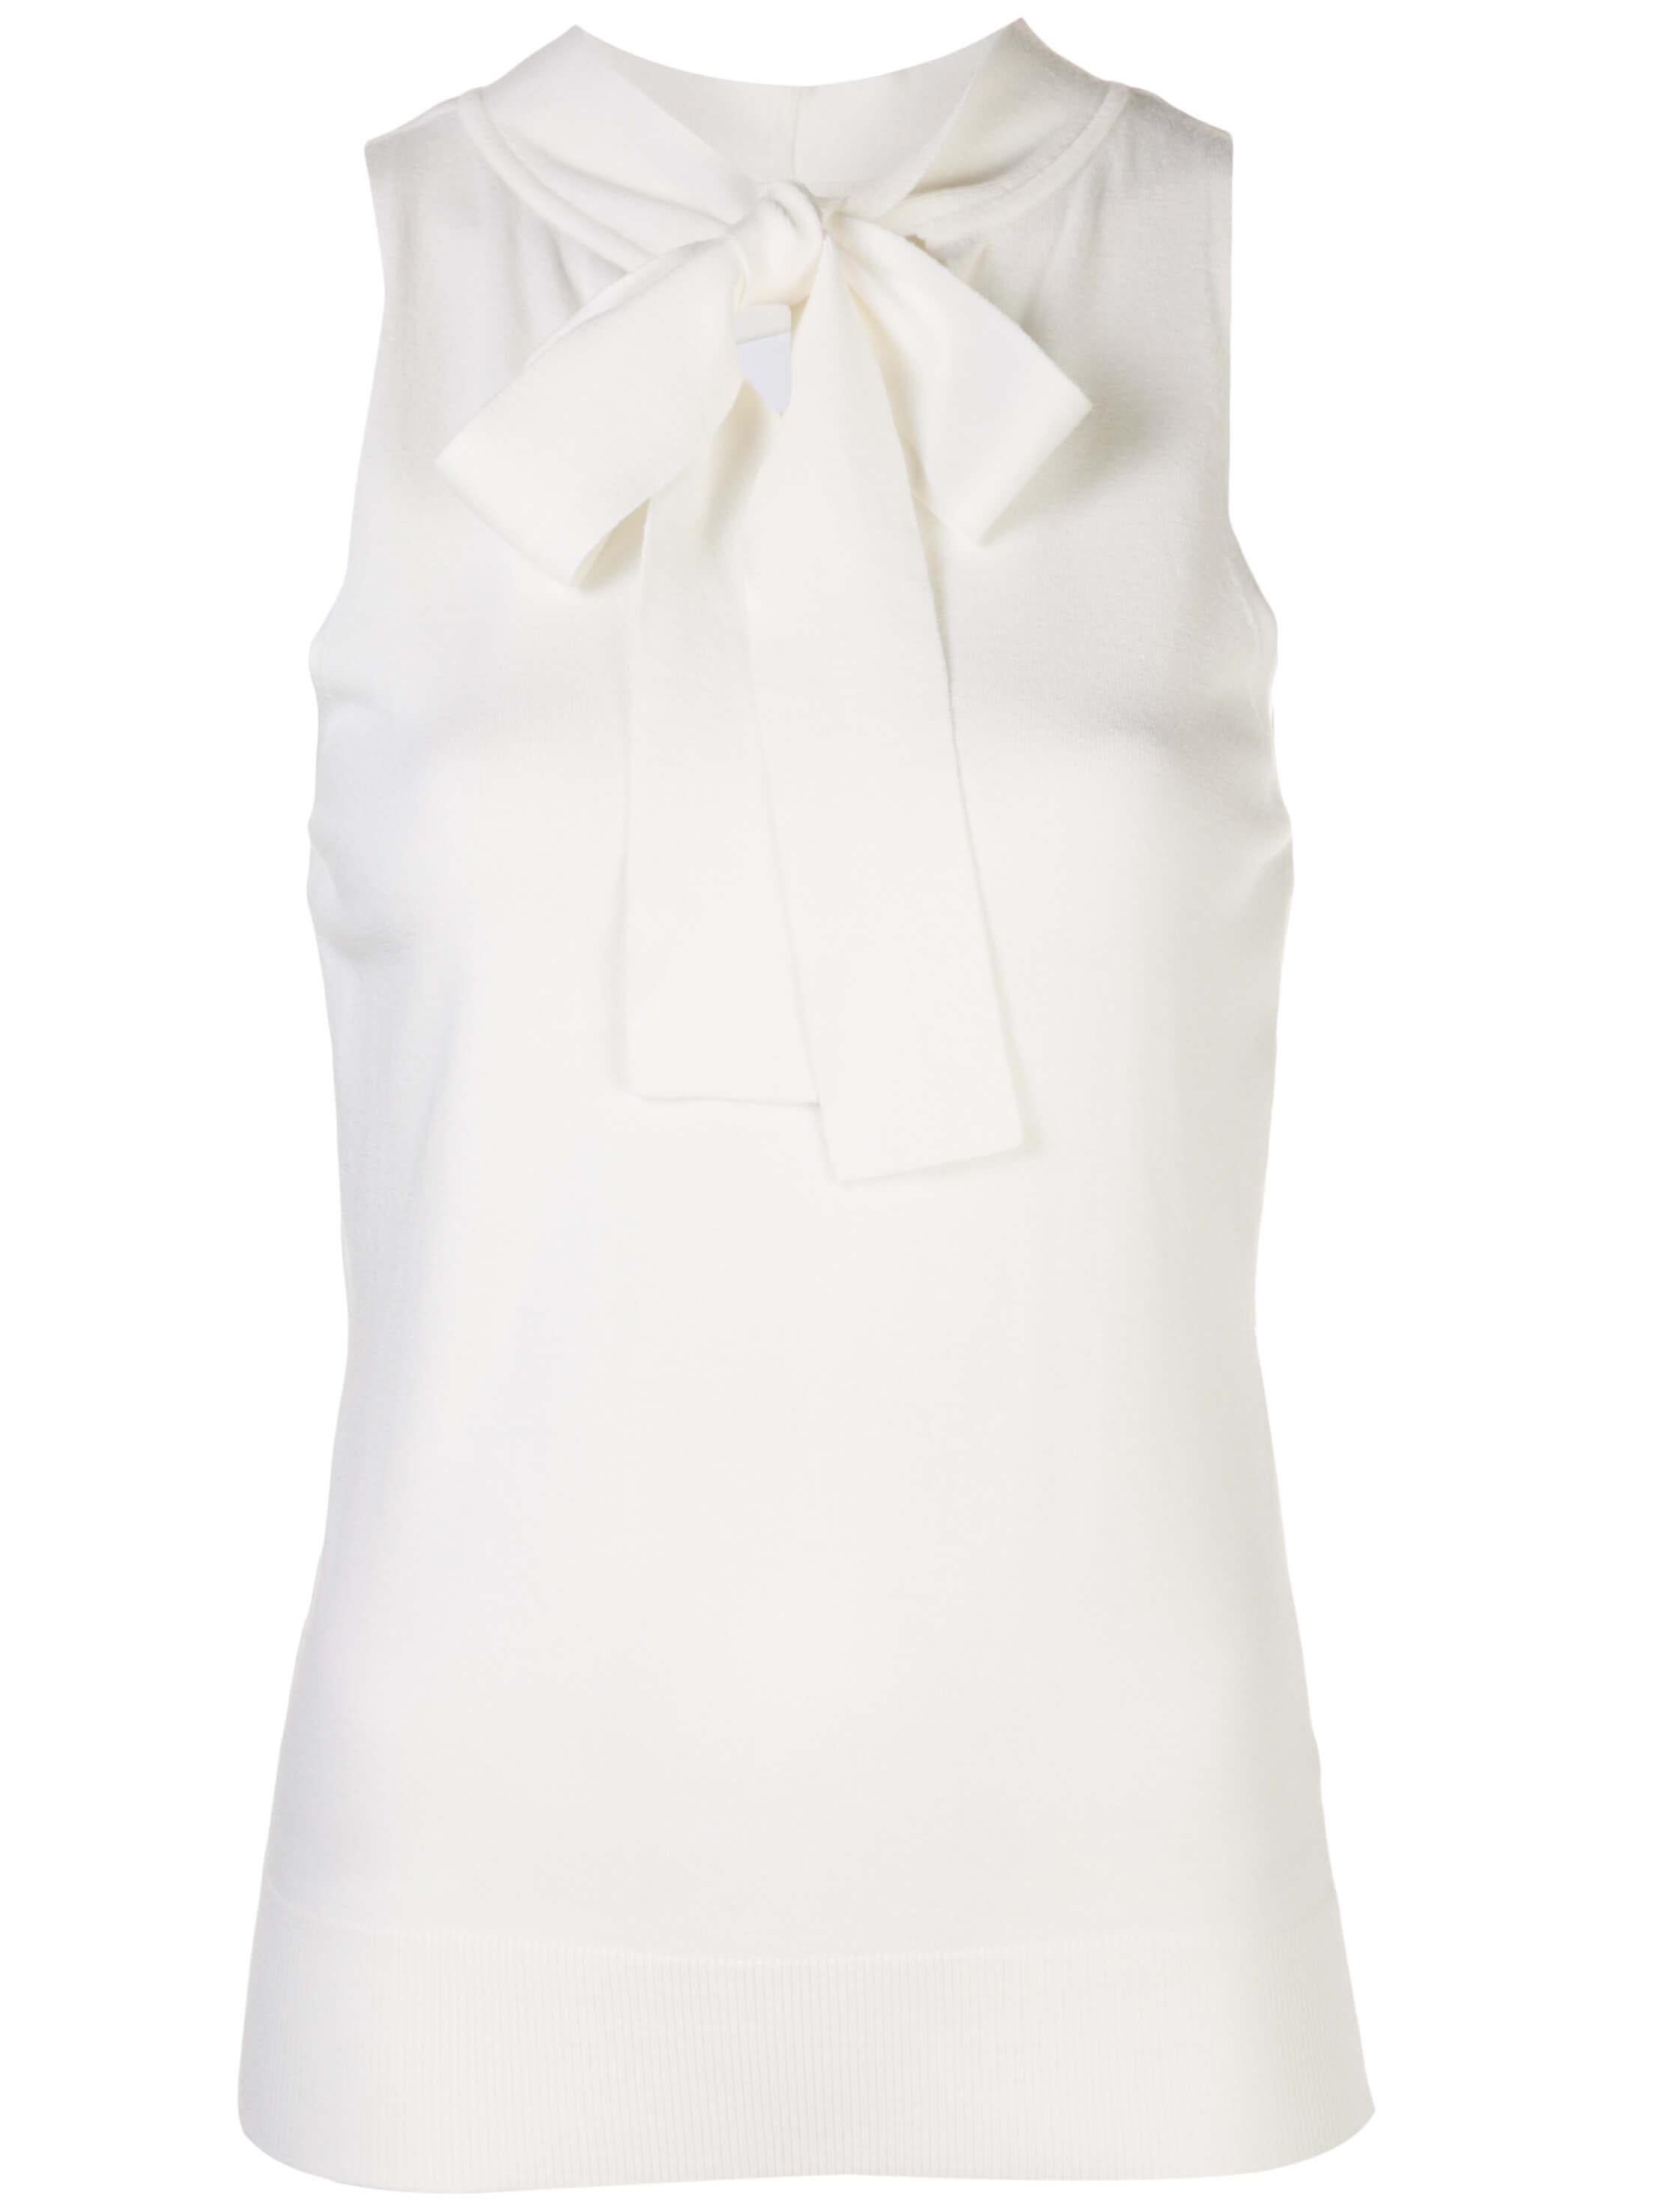 Tie Neck Sleeveless Knit Shell Item # KRT005